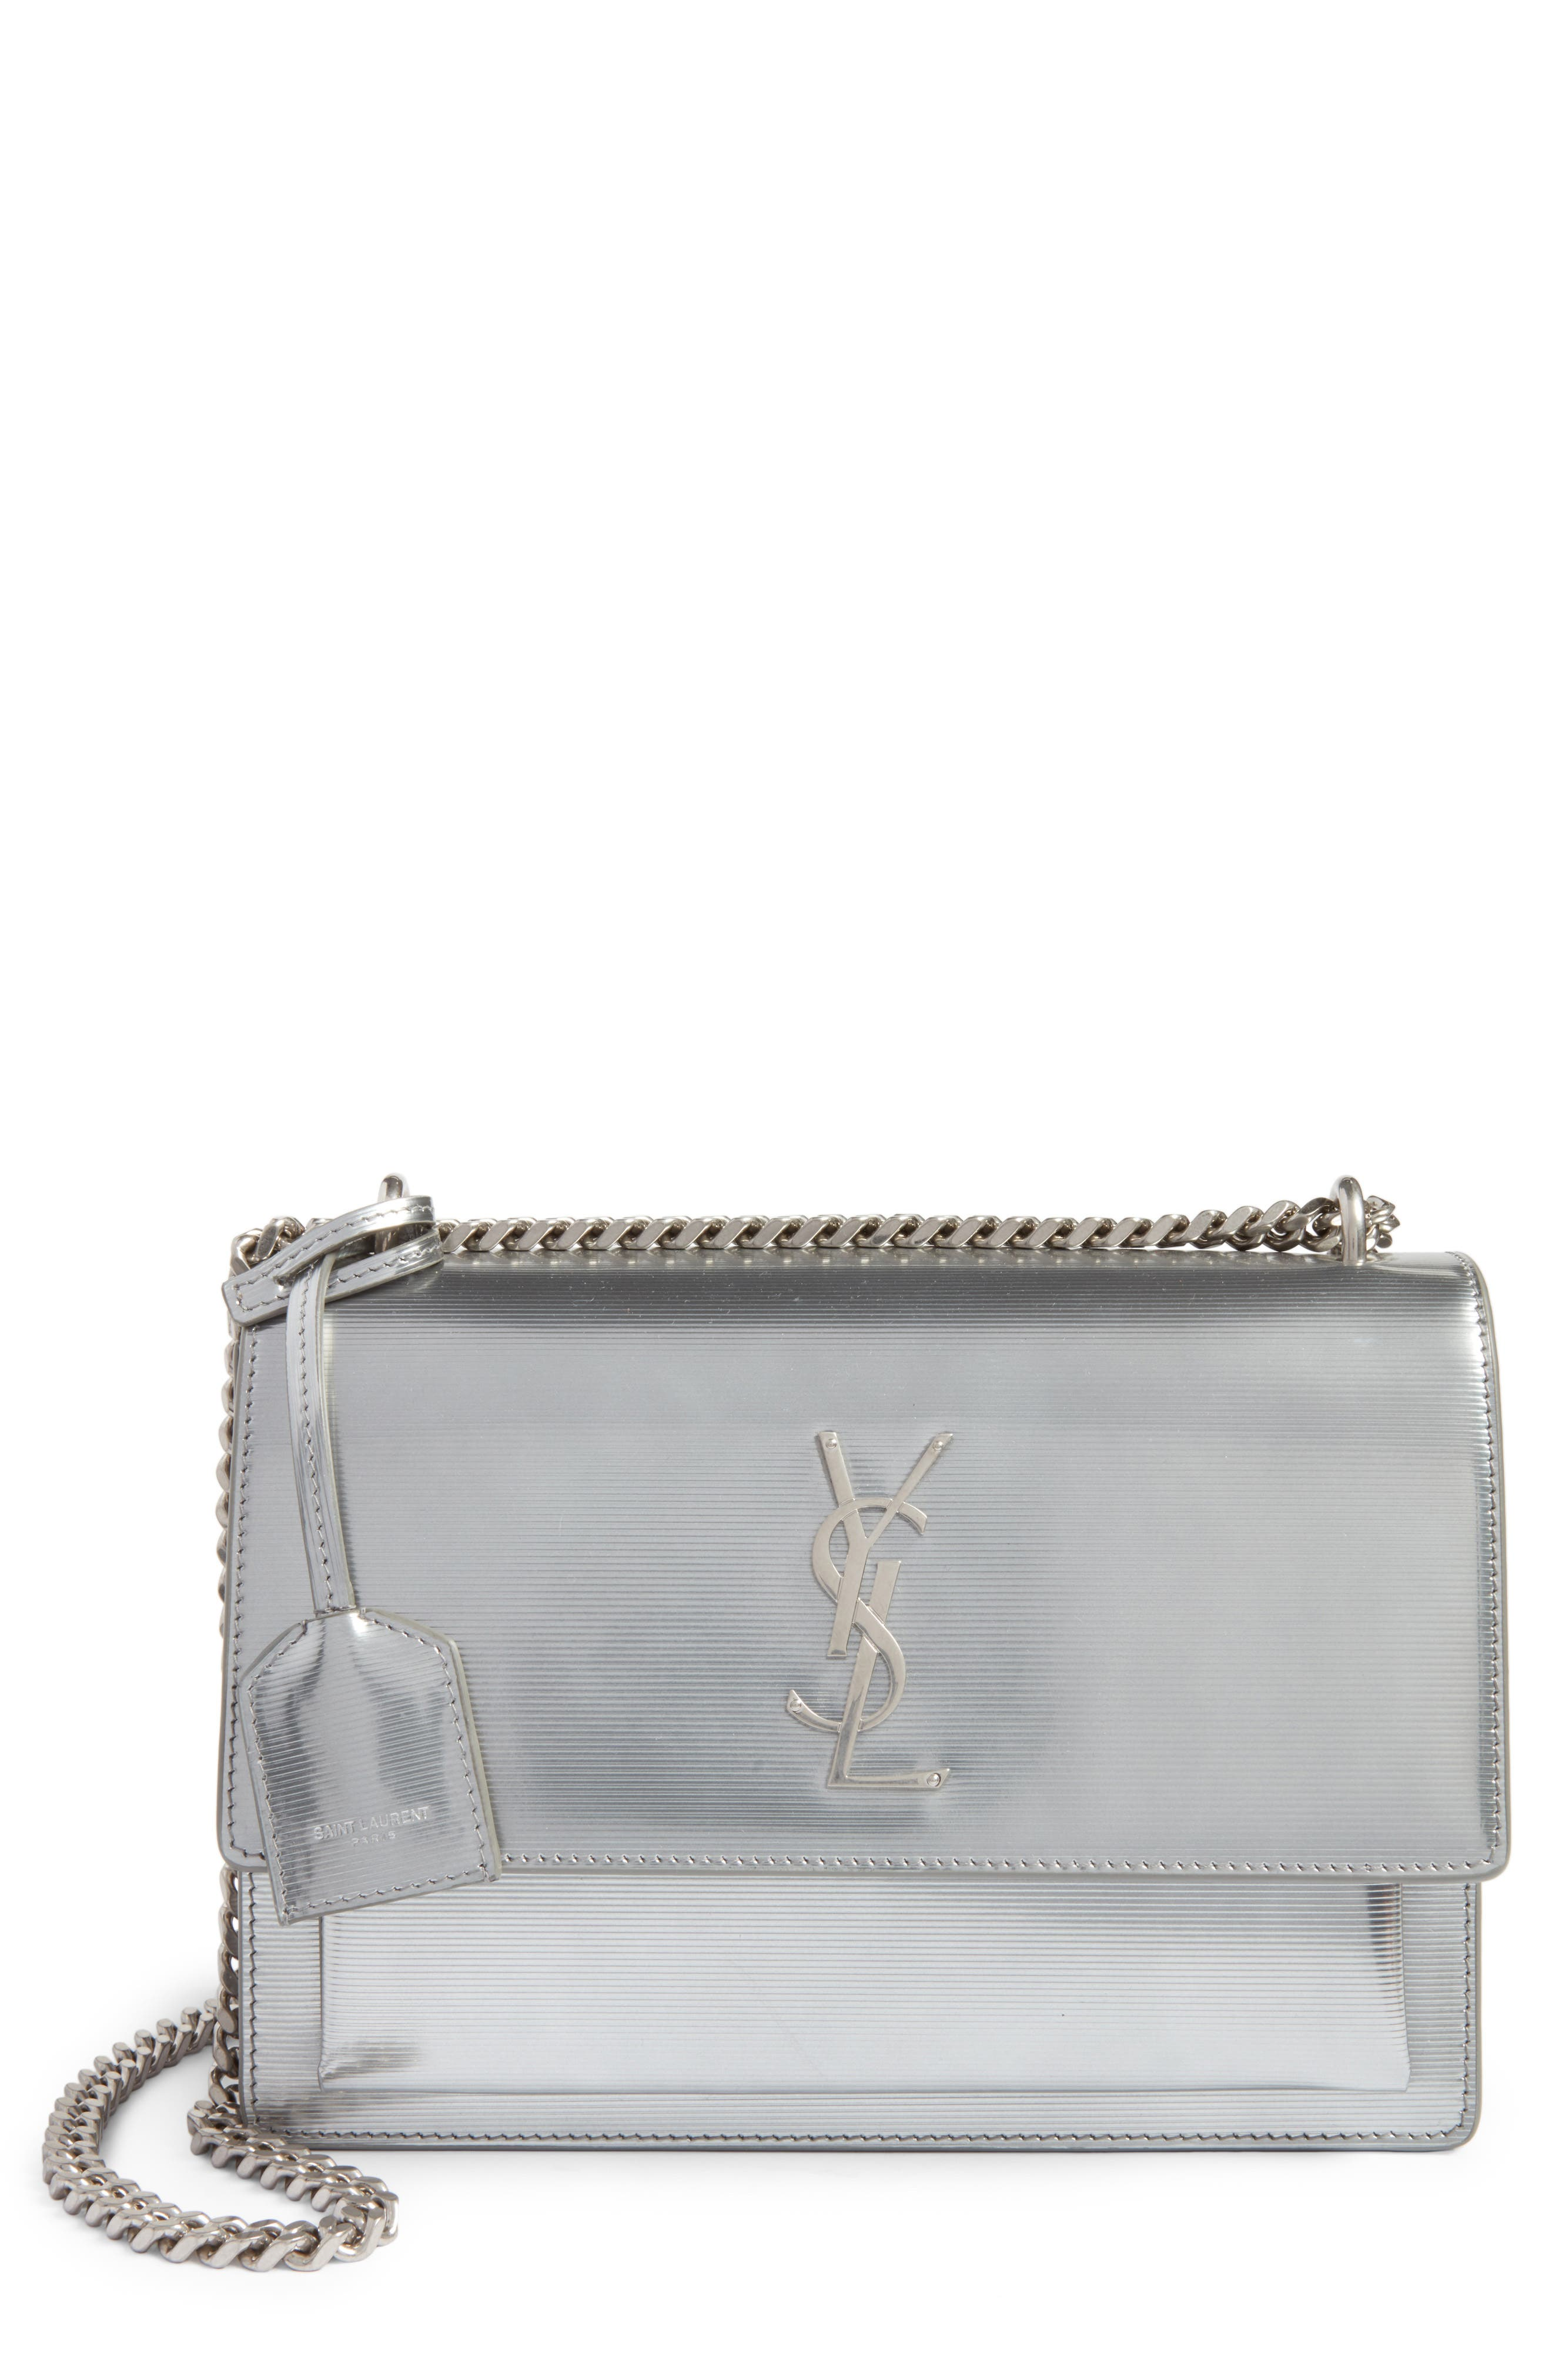 Main Image - Saint Laurent Medium Sunset Opium Leather Crossbody Bag